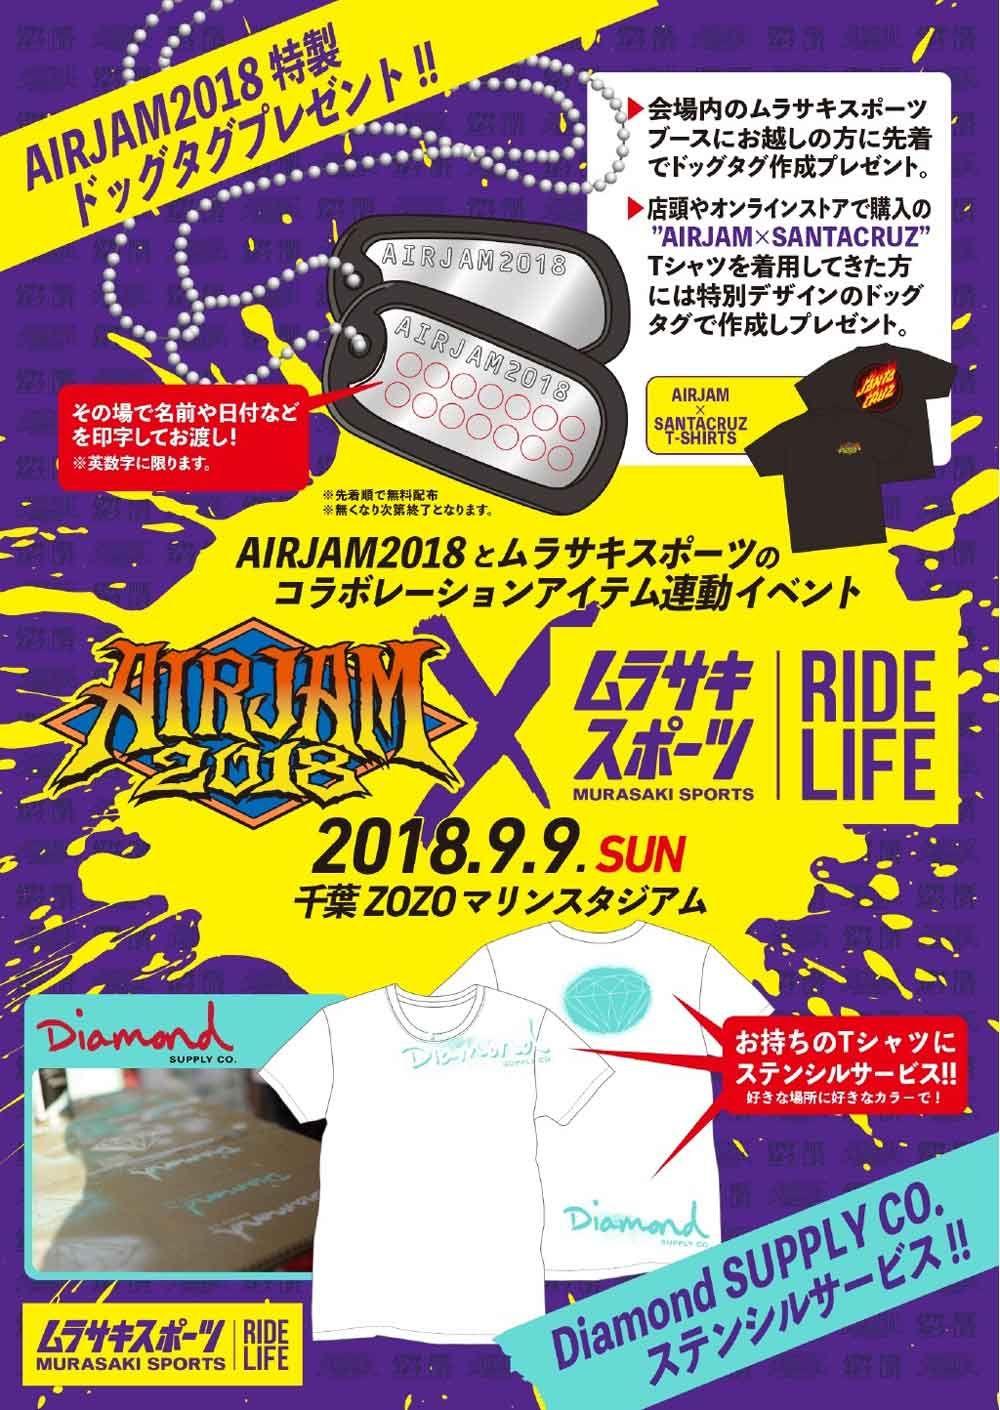 AIRJAM2018×ムラサキスポーツ スペシャルコンテンツ